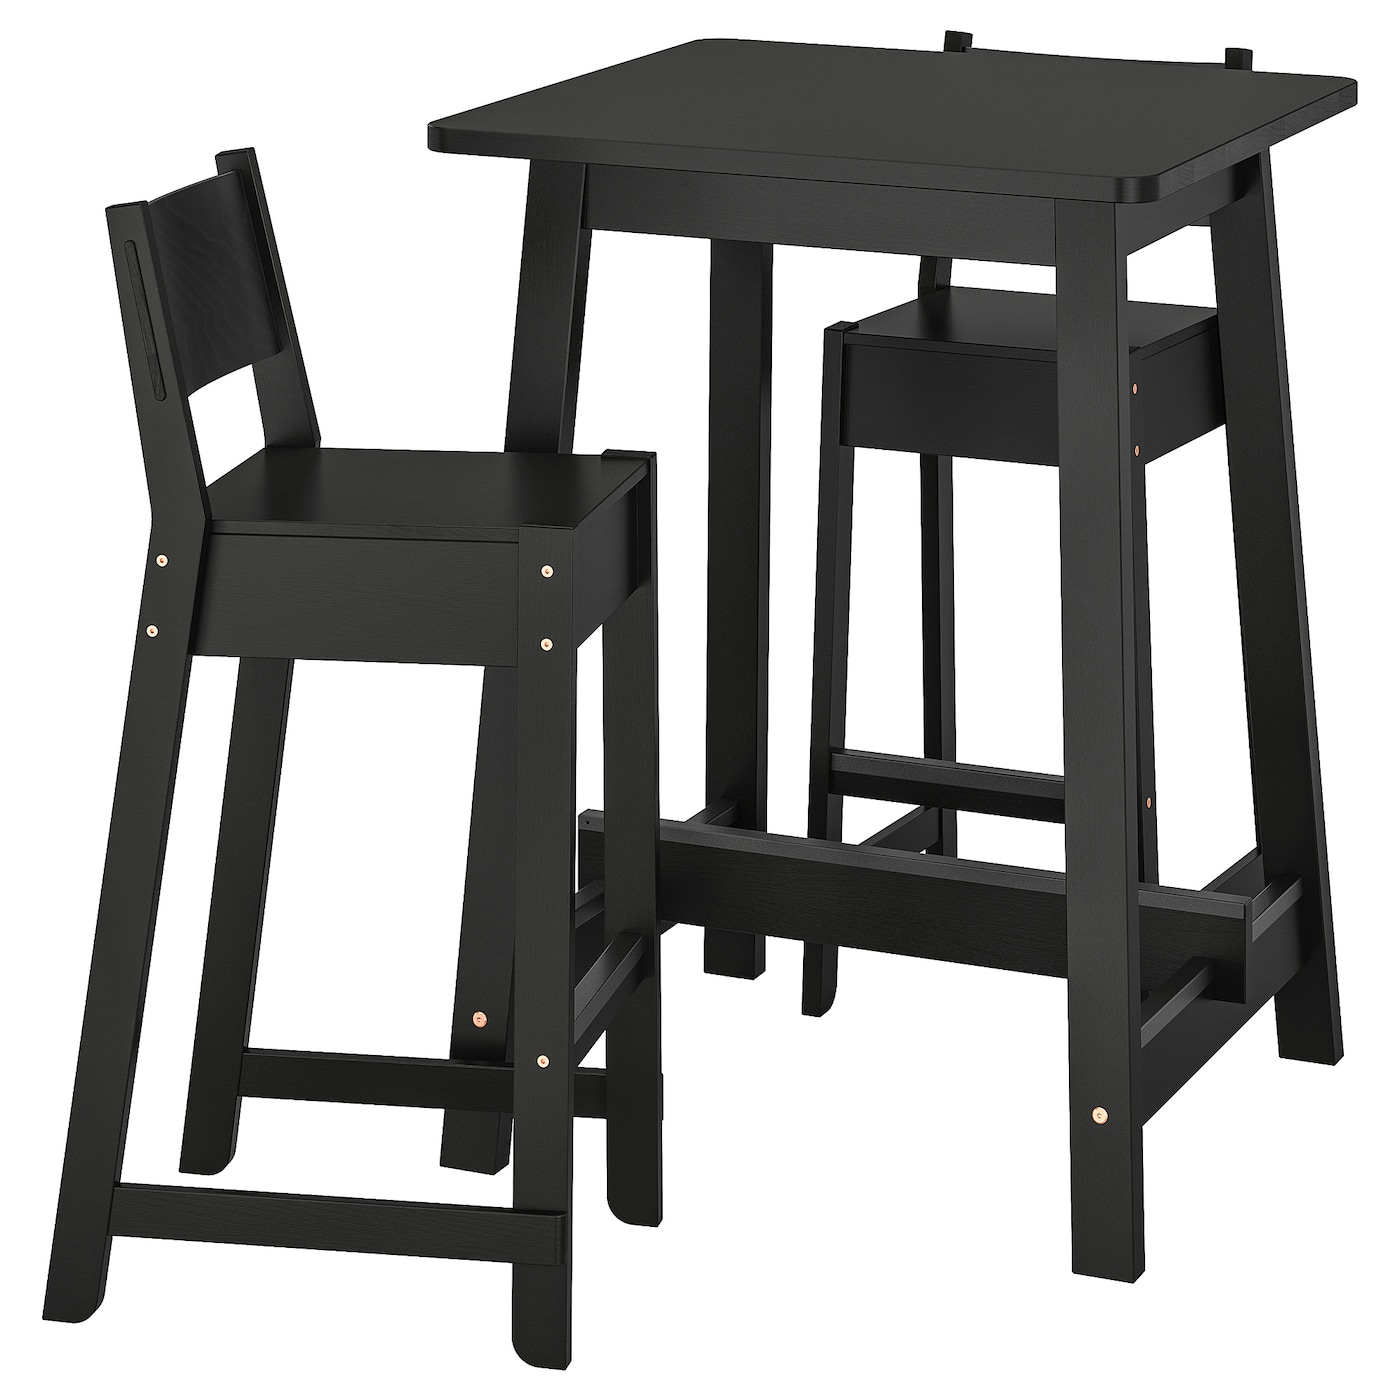 Ikea Norraker Theke 2 Barstuhle Schwarz Schwarz Moebel Suchmaschine Ladendirekt De